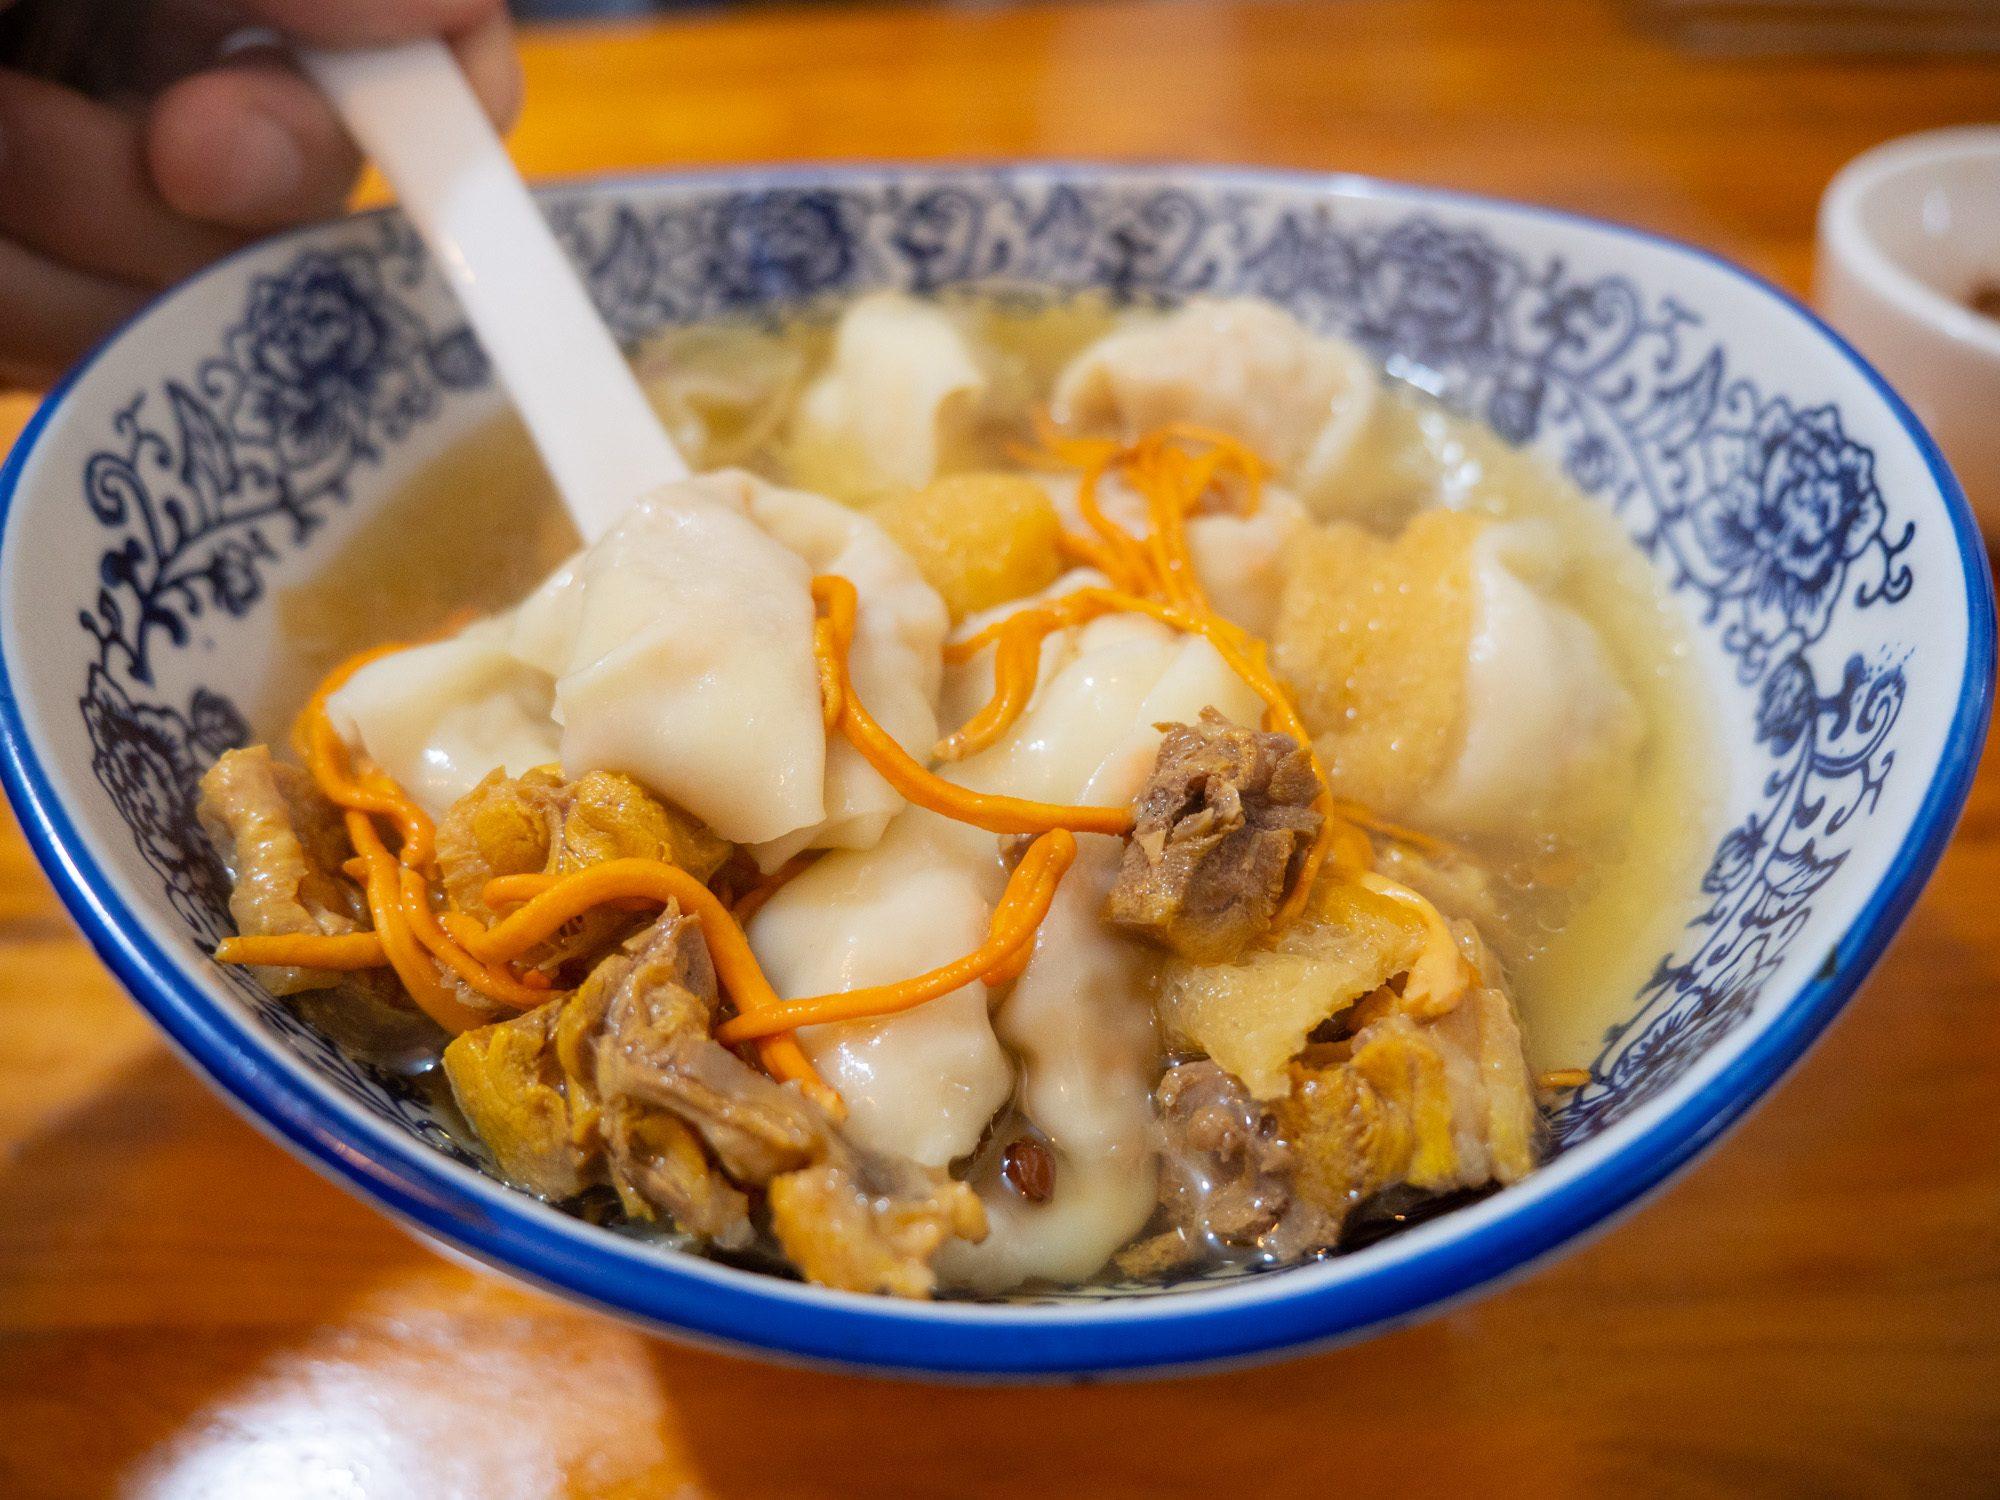 The chicken and shrimp wontons at ganhaijiao chaoshou